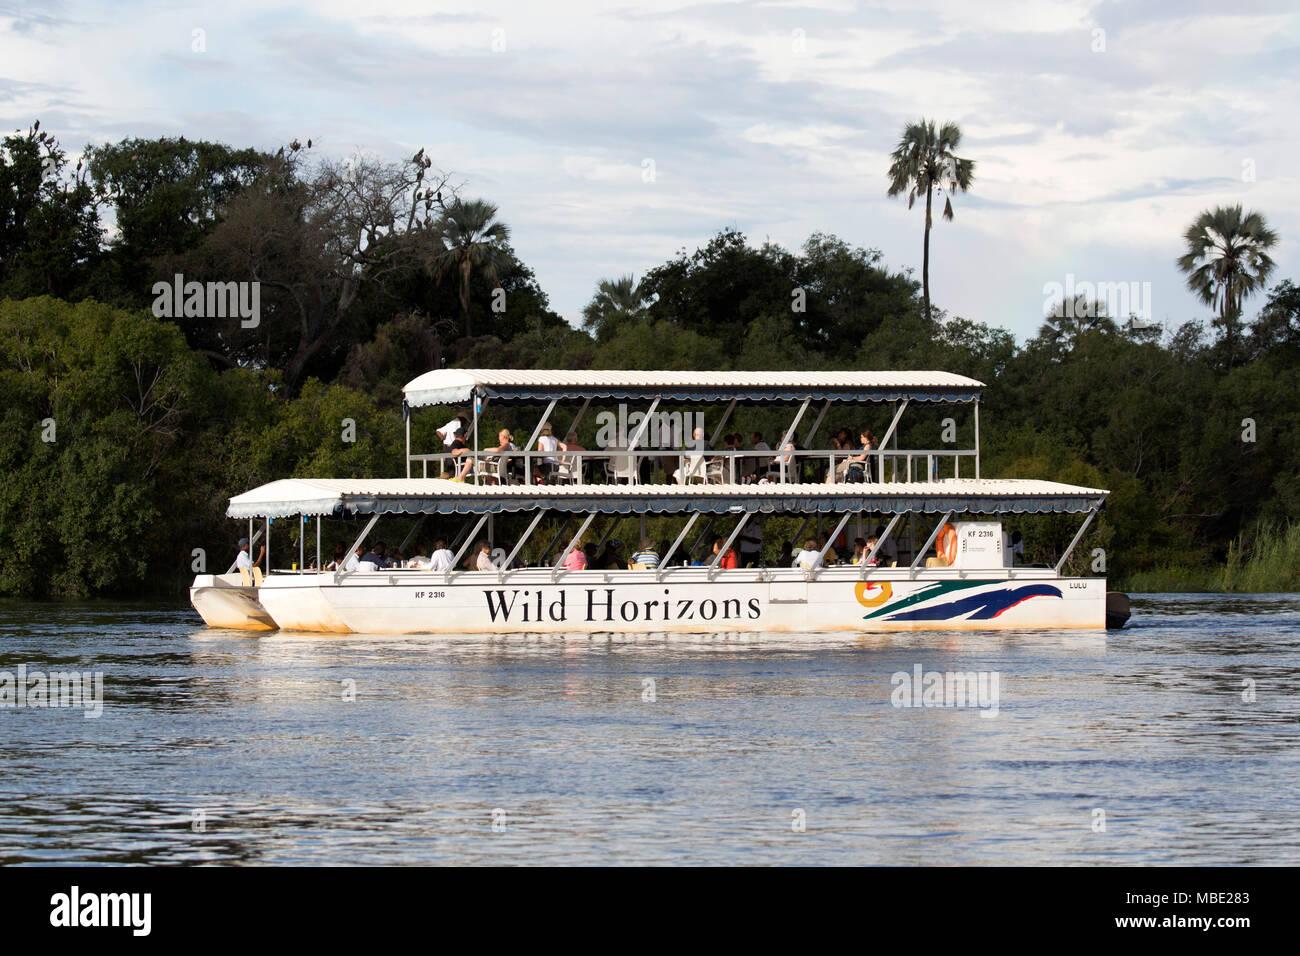 A Wild Horizons boat during a sunset cruise on the Zambezi River near Victoria Falls in Zimbabwe. - Stock Image